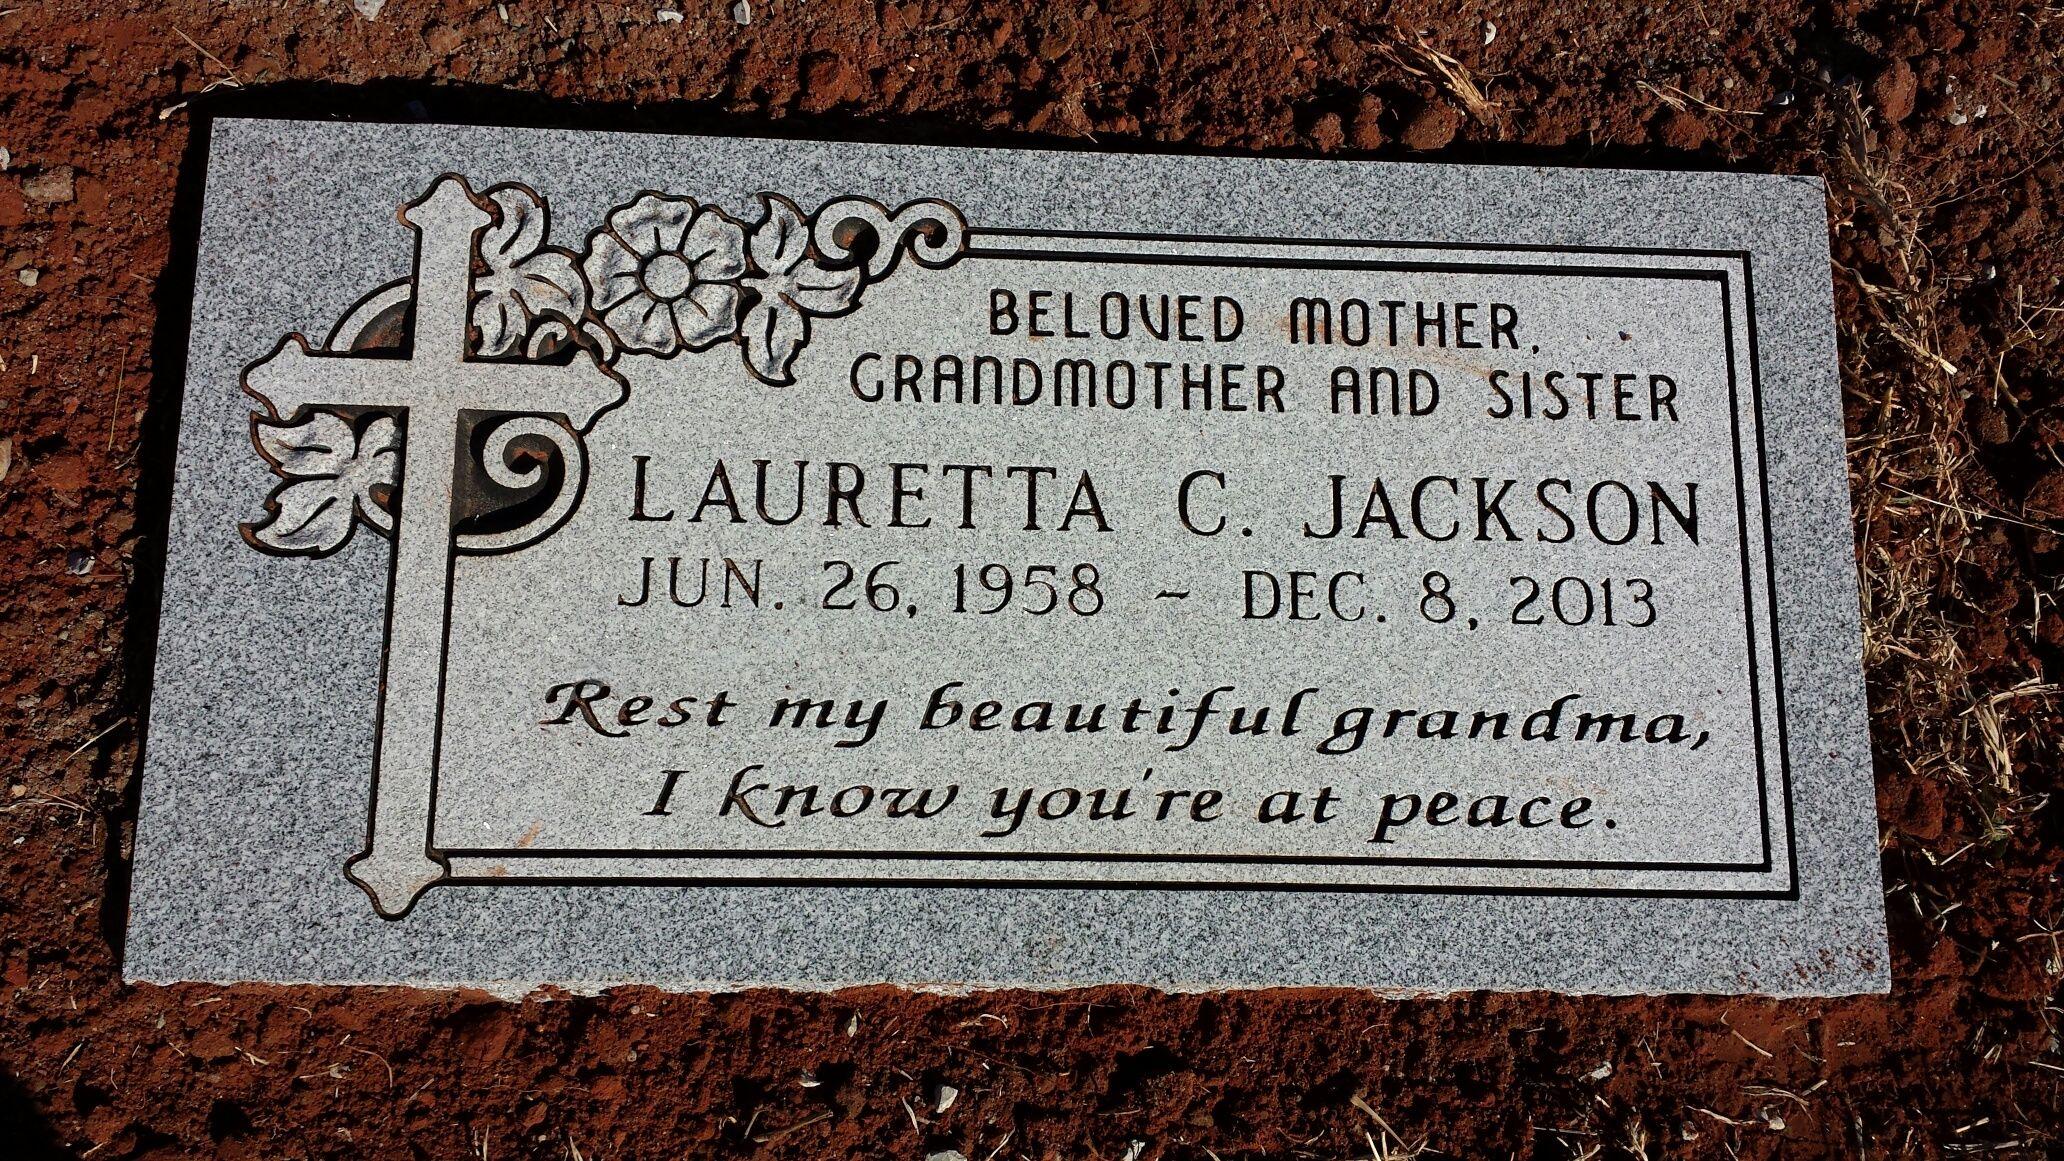 Jackson, Lauretta